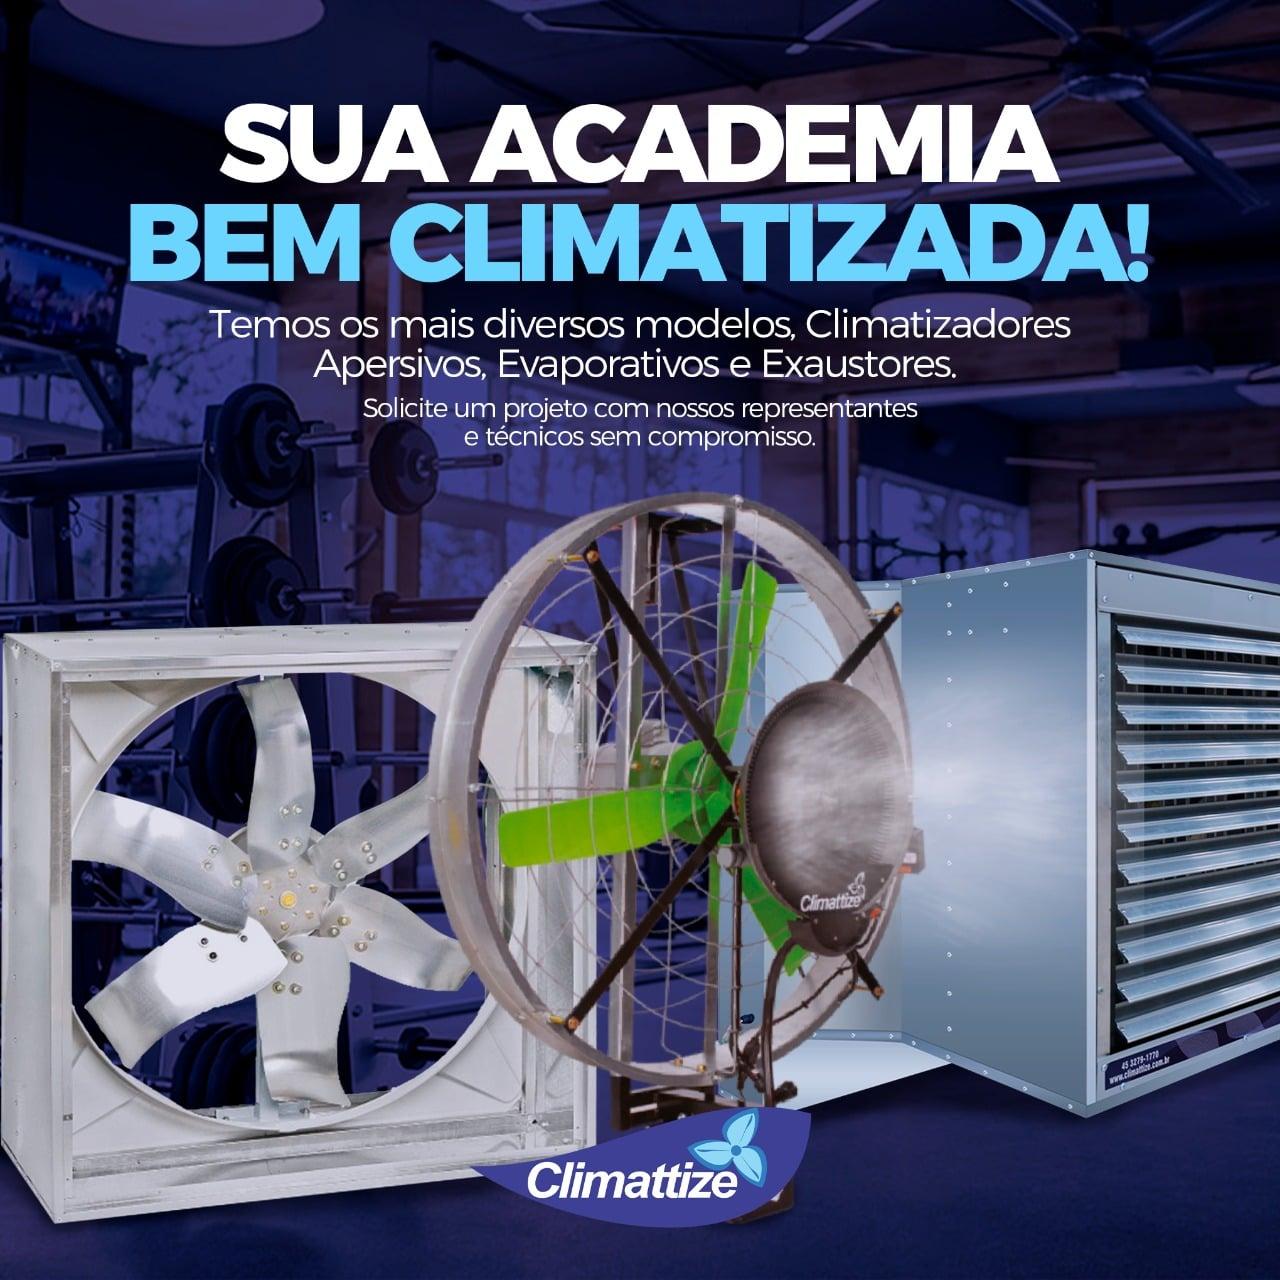 Sua academia climatizada